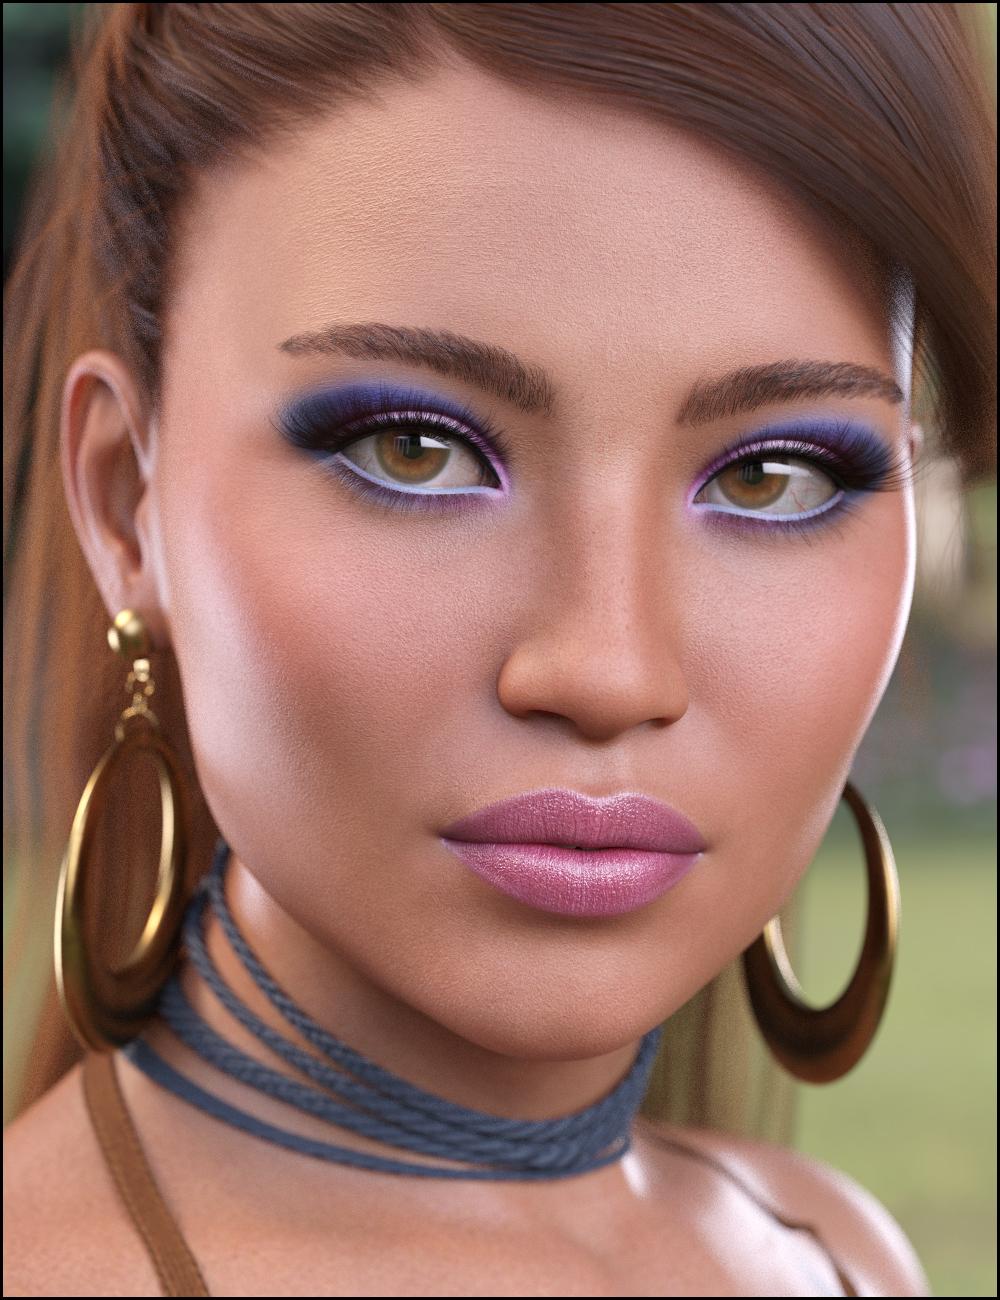 Devery for Alawa 8 by: JessaiiRaziel, 3D Models by Daz 3D